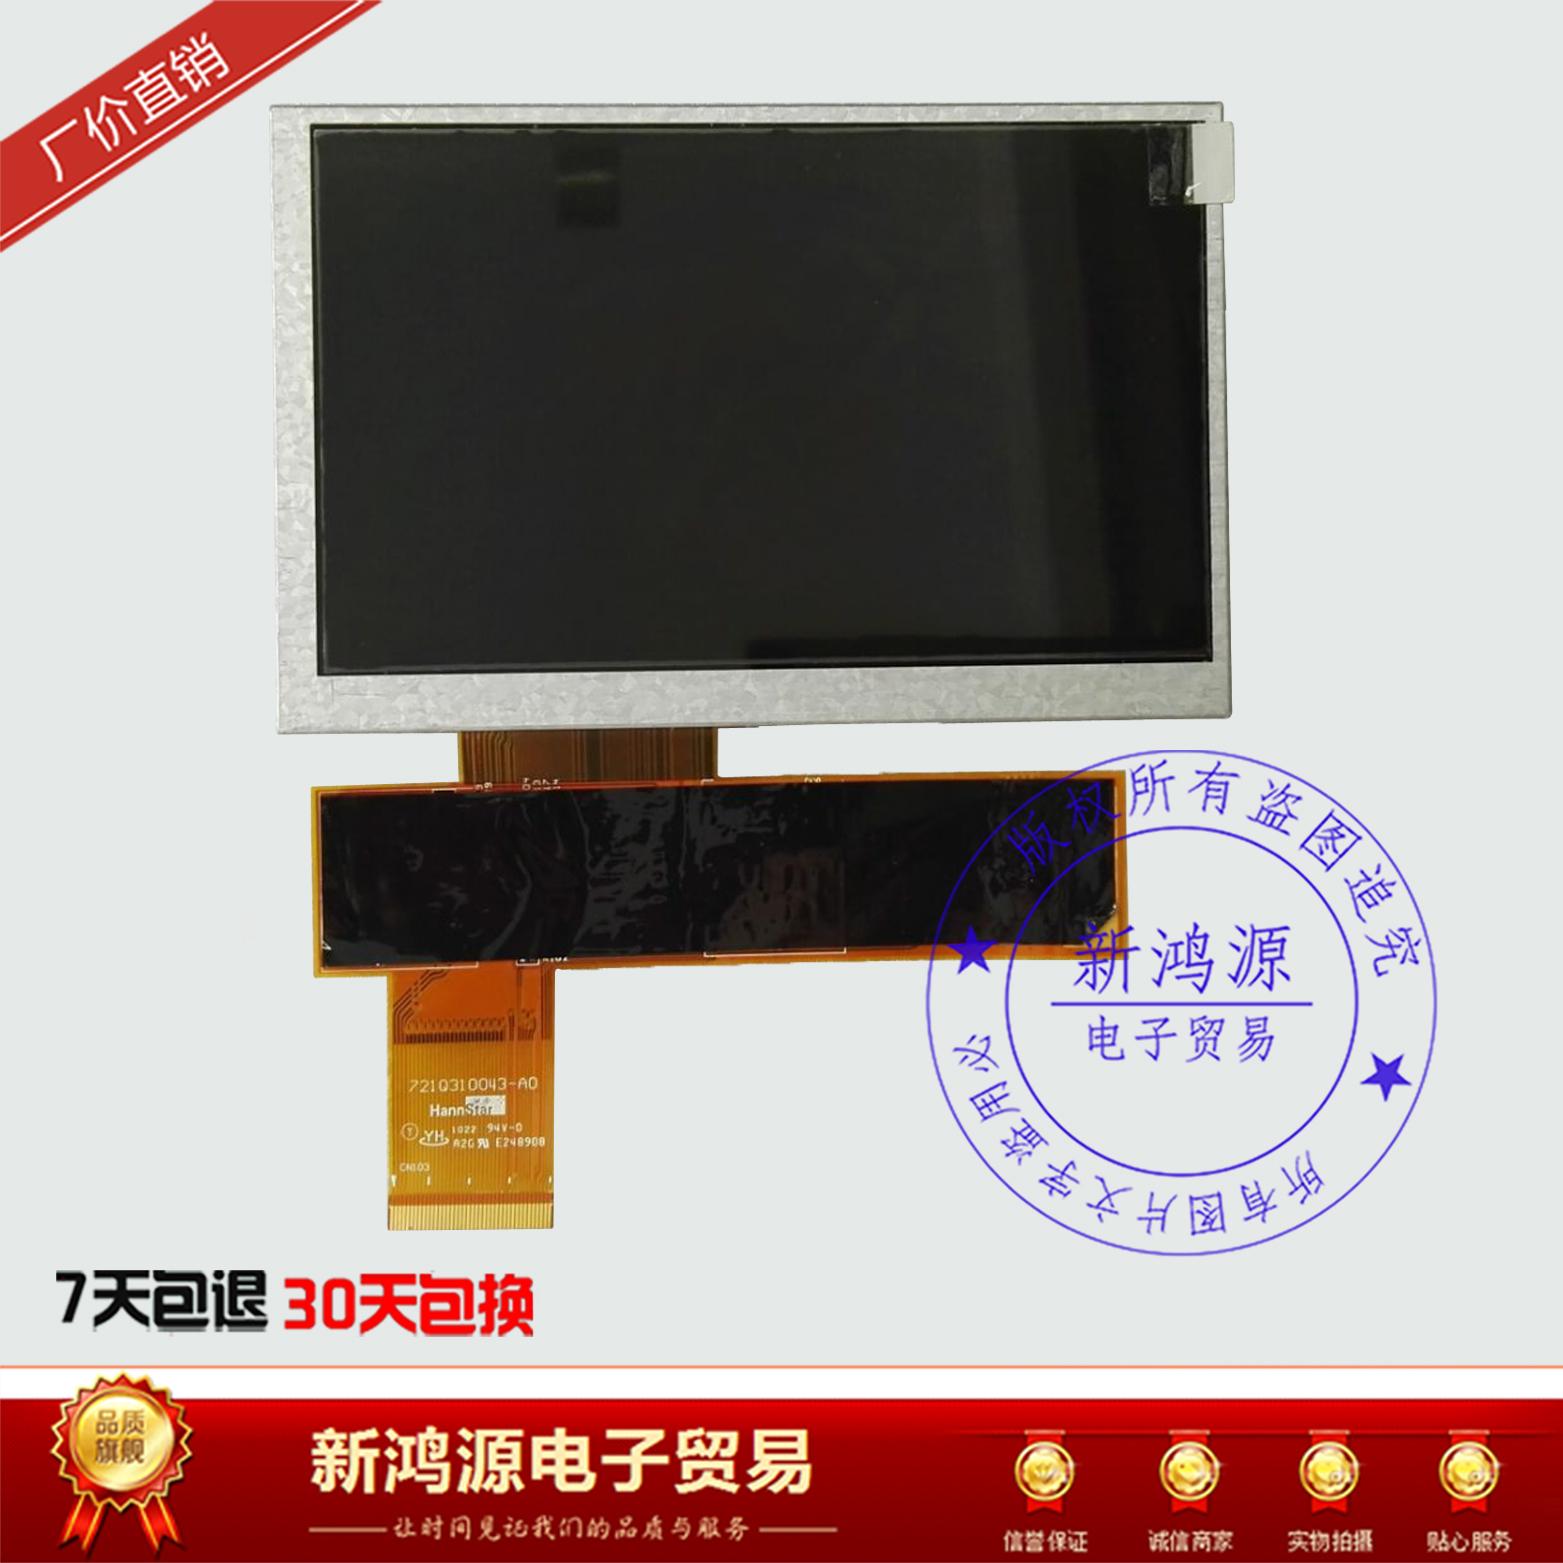 HSD050IDW1 -A30 mp4掌上电视GPS便携导航可另外配触摸